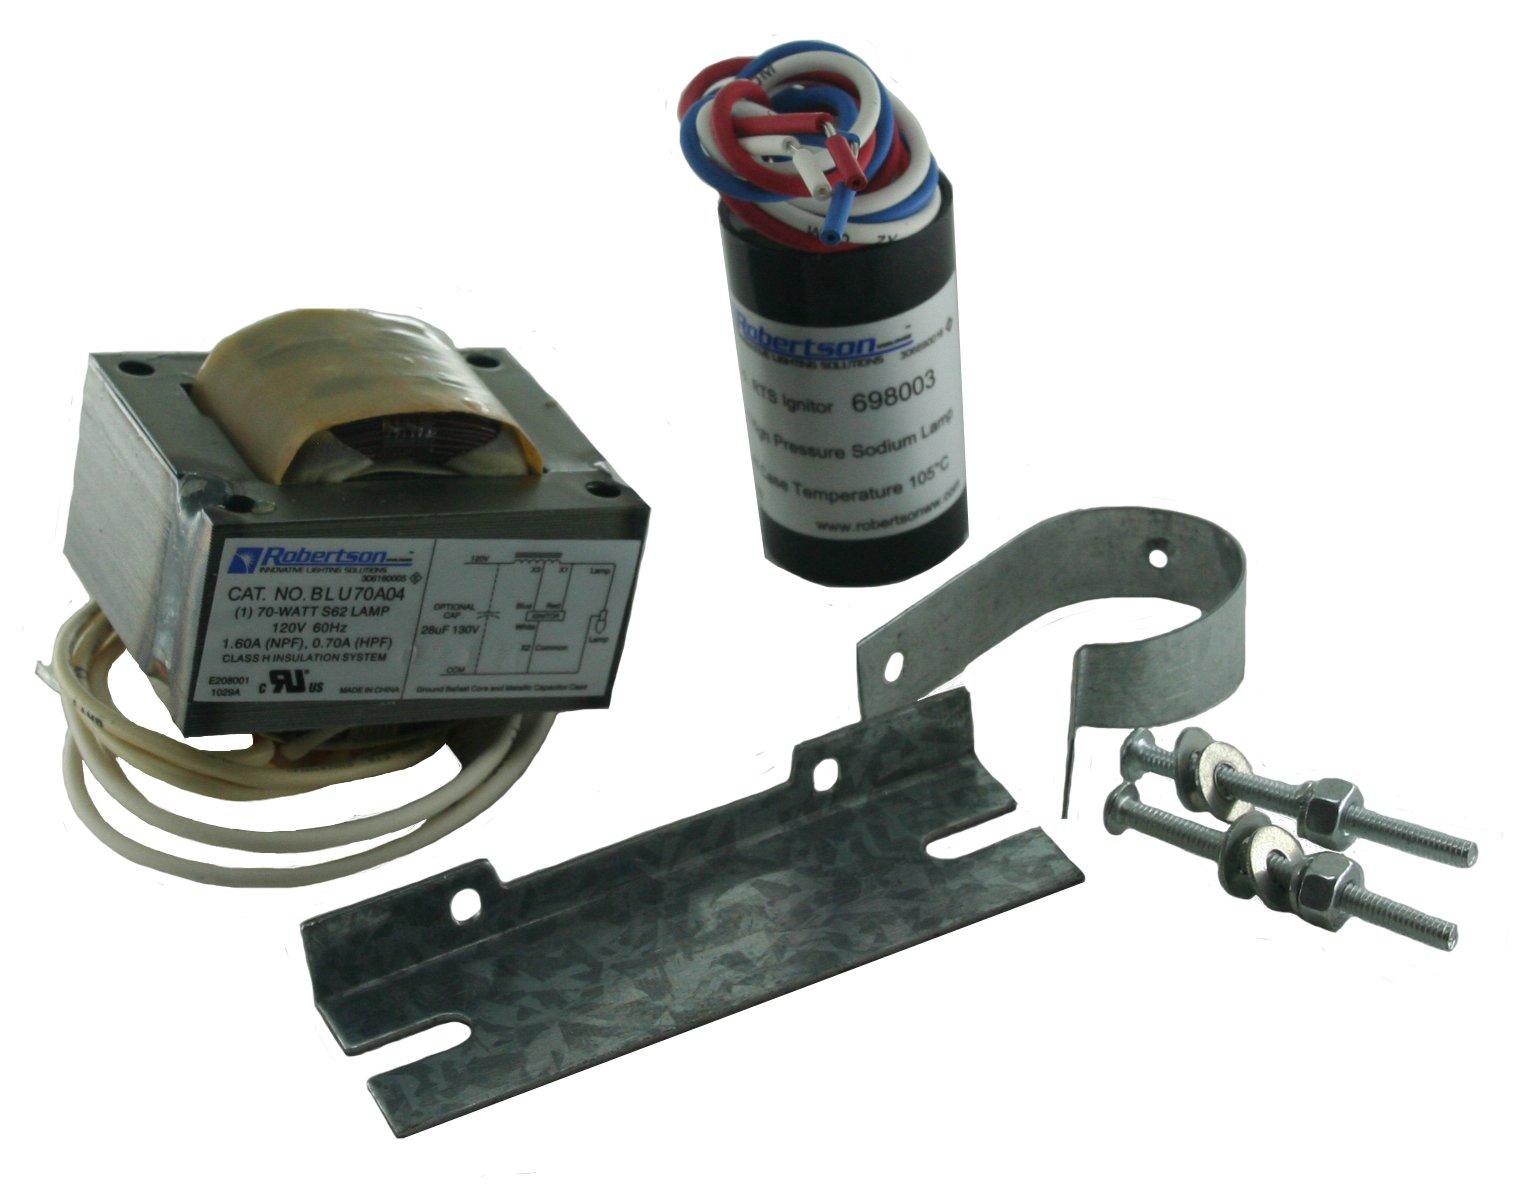 ROBERTSON 3P10058 Individual mHID, 70 Watt, S62 High Pressure Sodium Lamp, 120Vac., 60Hz, Normal Ballast Factor, NPF, Model BLU0070A04900 M (Replaces Model BLU070A04900)